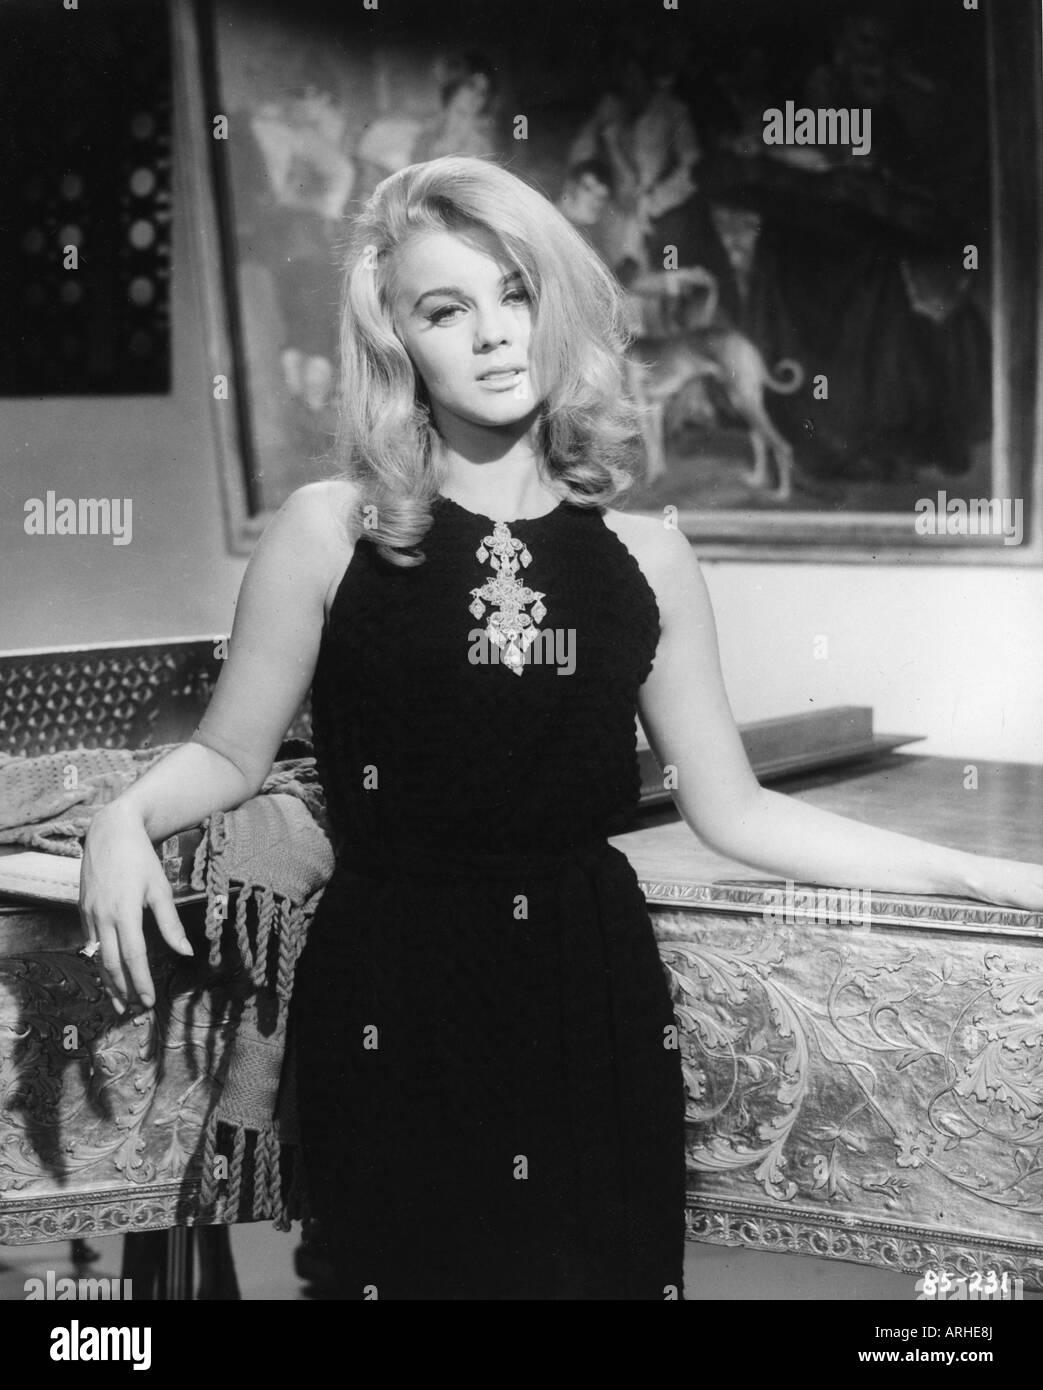 Ann-Margret, * 28.4.1941, Swedish actress, half length,  early 1960s, birth name Ann-Margret Olsson, Ann Margret, - Stock Image